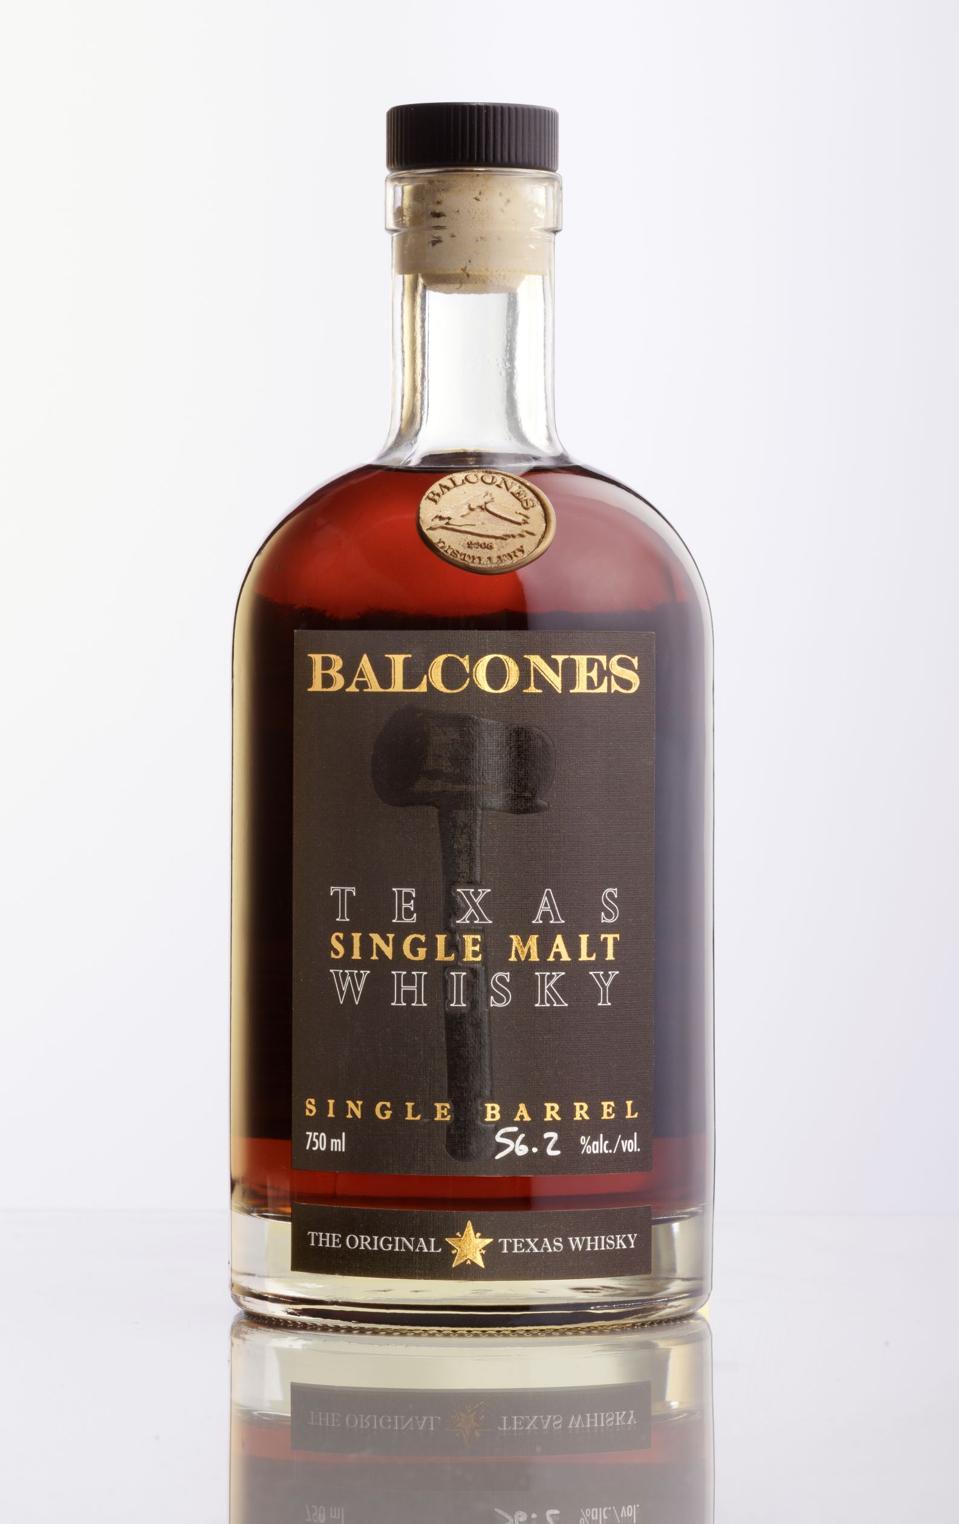 Balcones, Texas Single Malt Whisky, Single Barrel